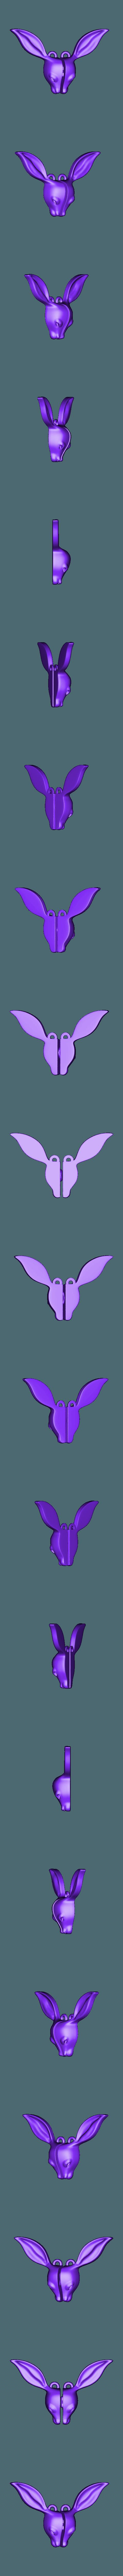 Bunny BFFs Keychain.stl Download free STL file Woodlands BFF Keychains • 3D printer object, Emiliano_Brignito